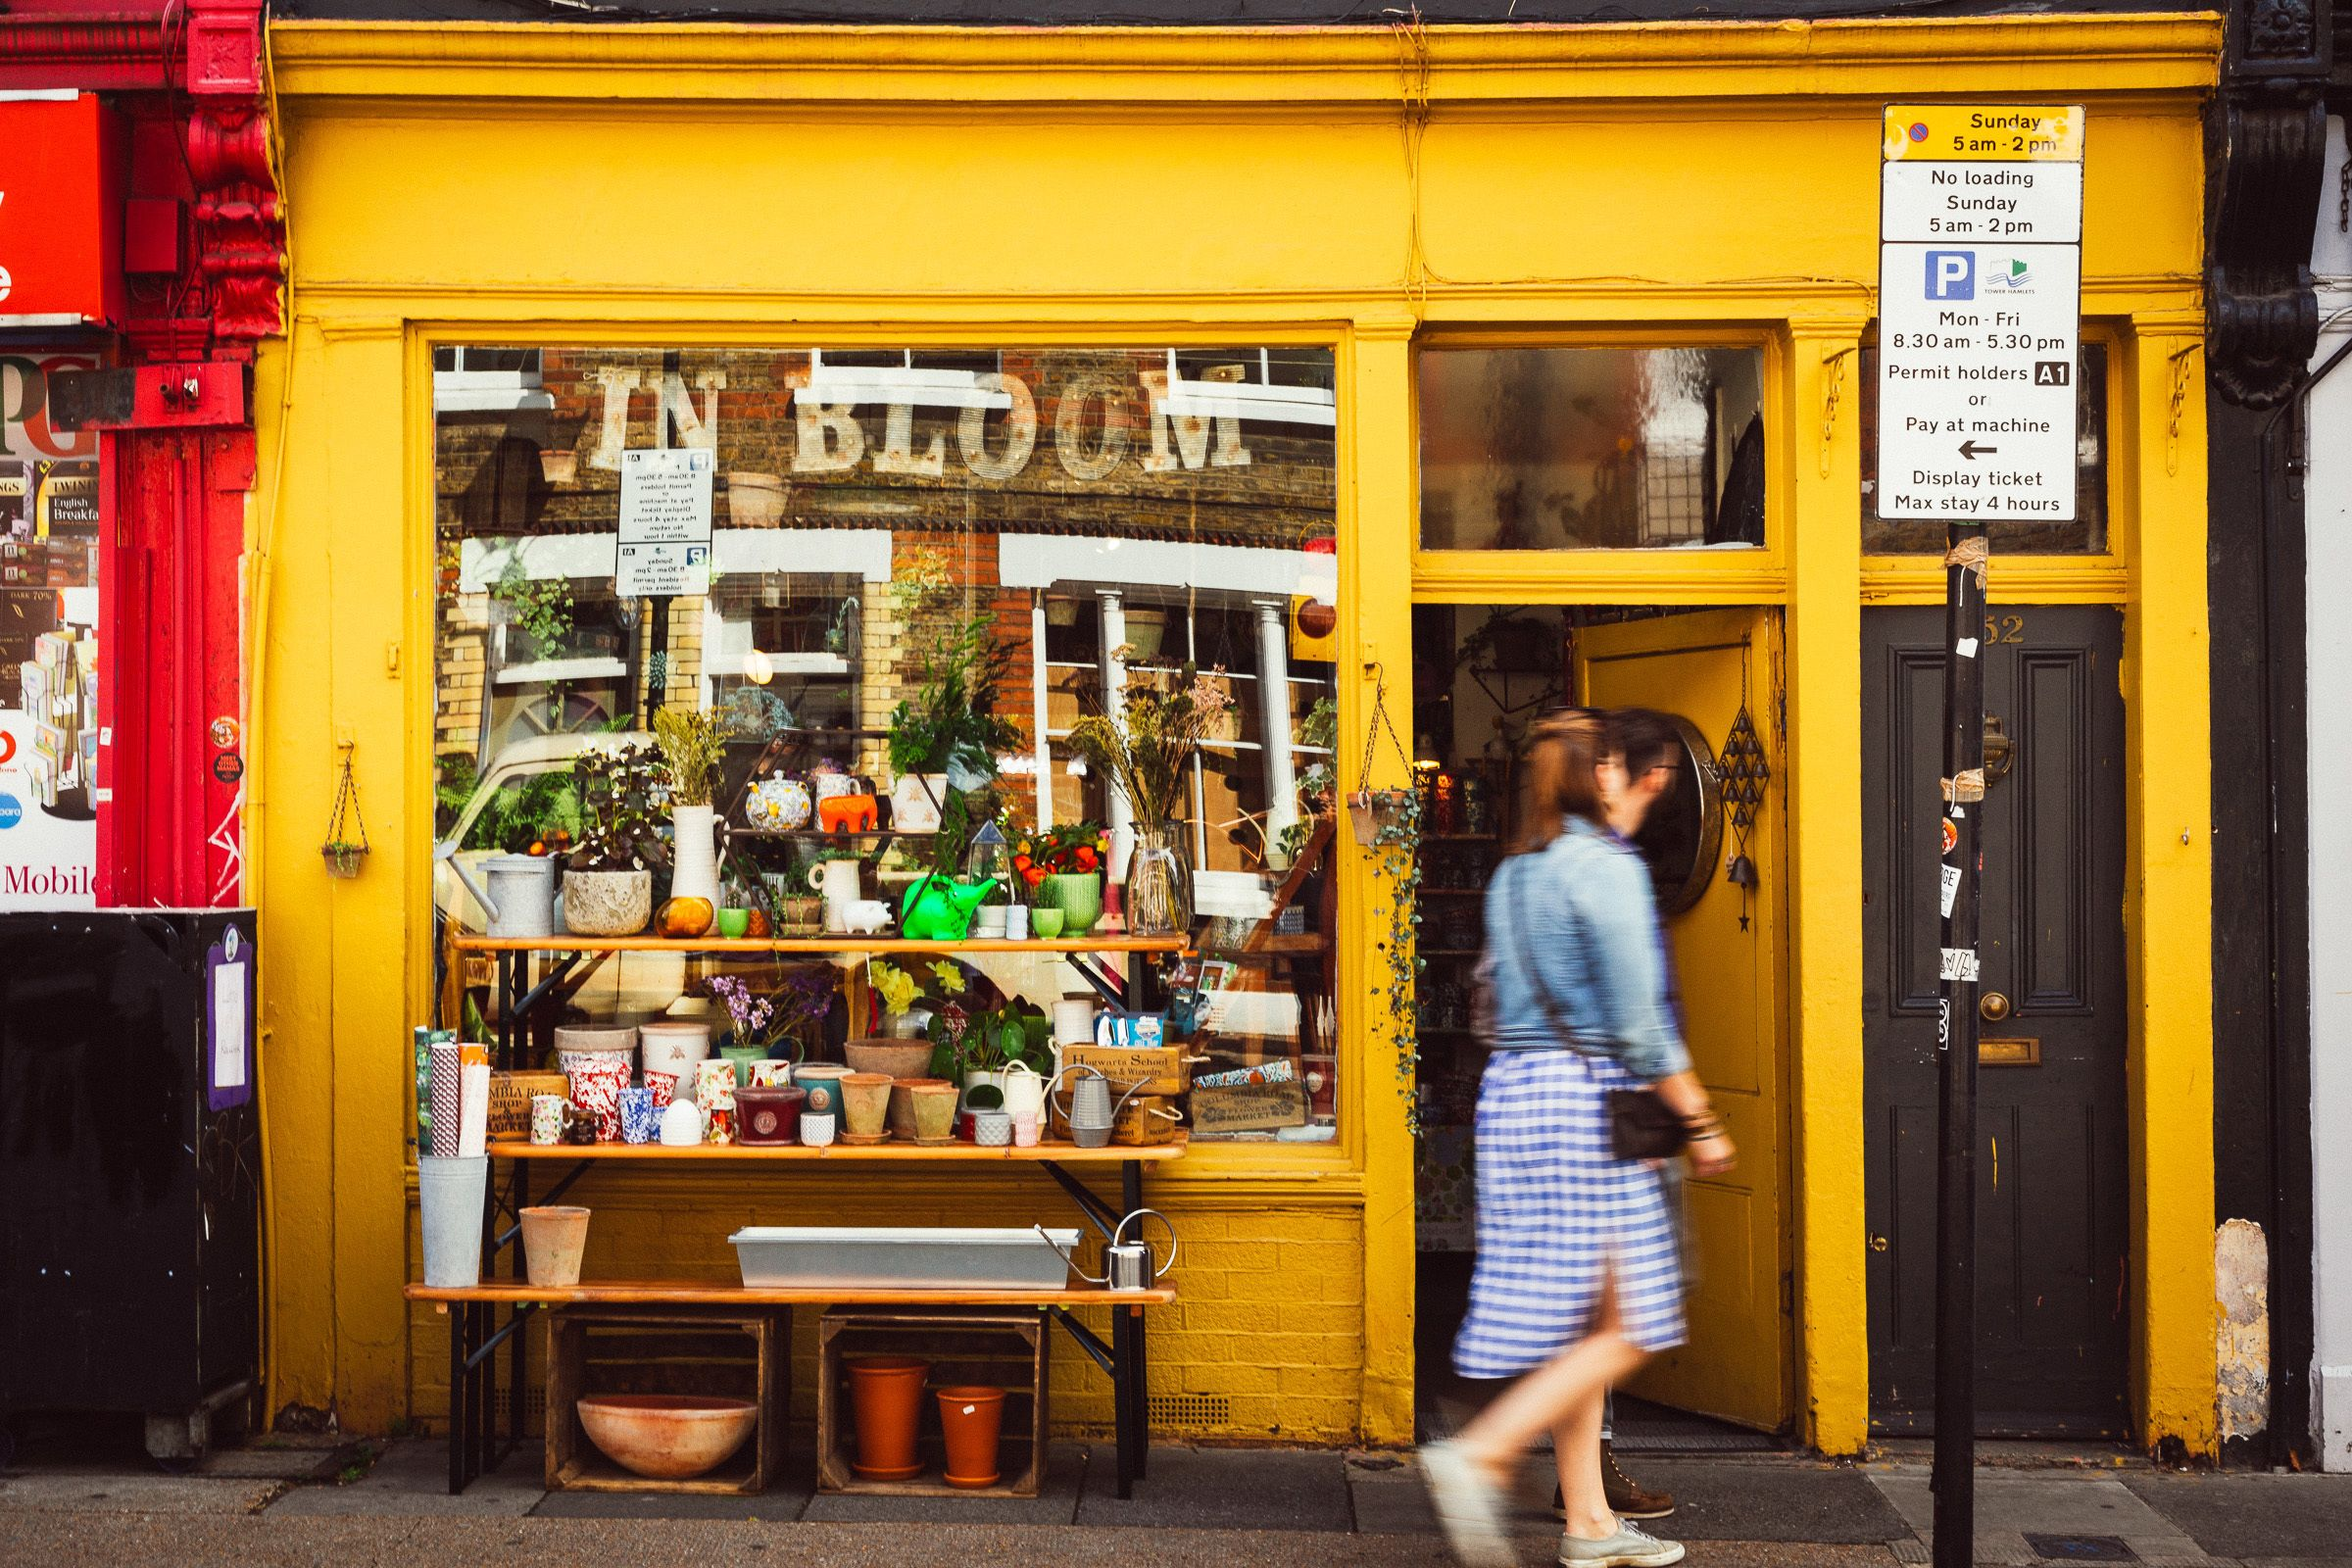 Shop in London's Urban Jungle